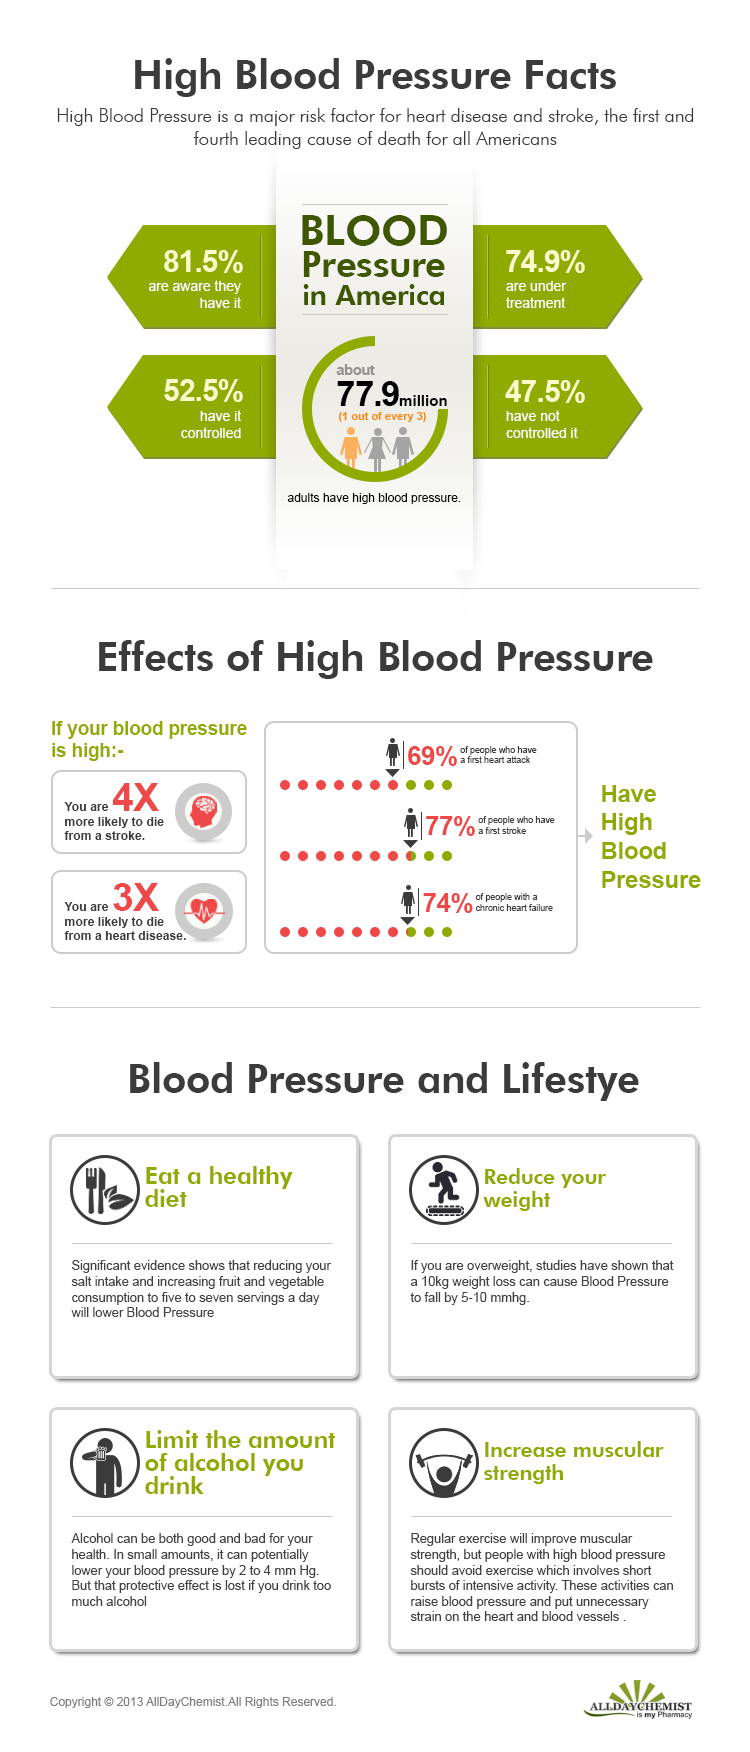 Blood-Pressure-_info_2.jpg